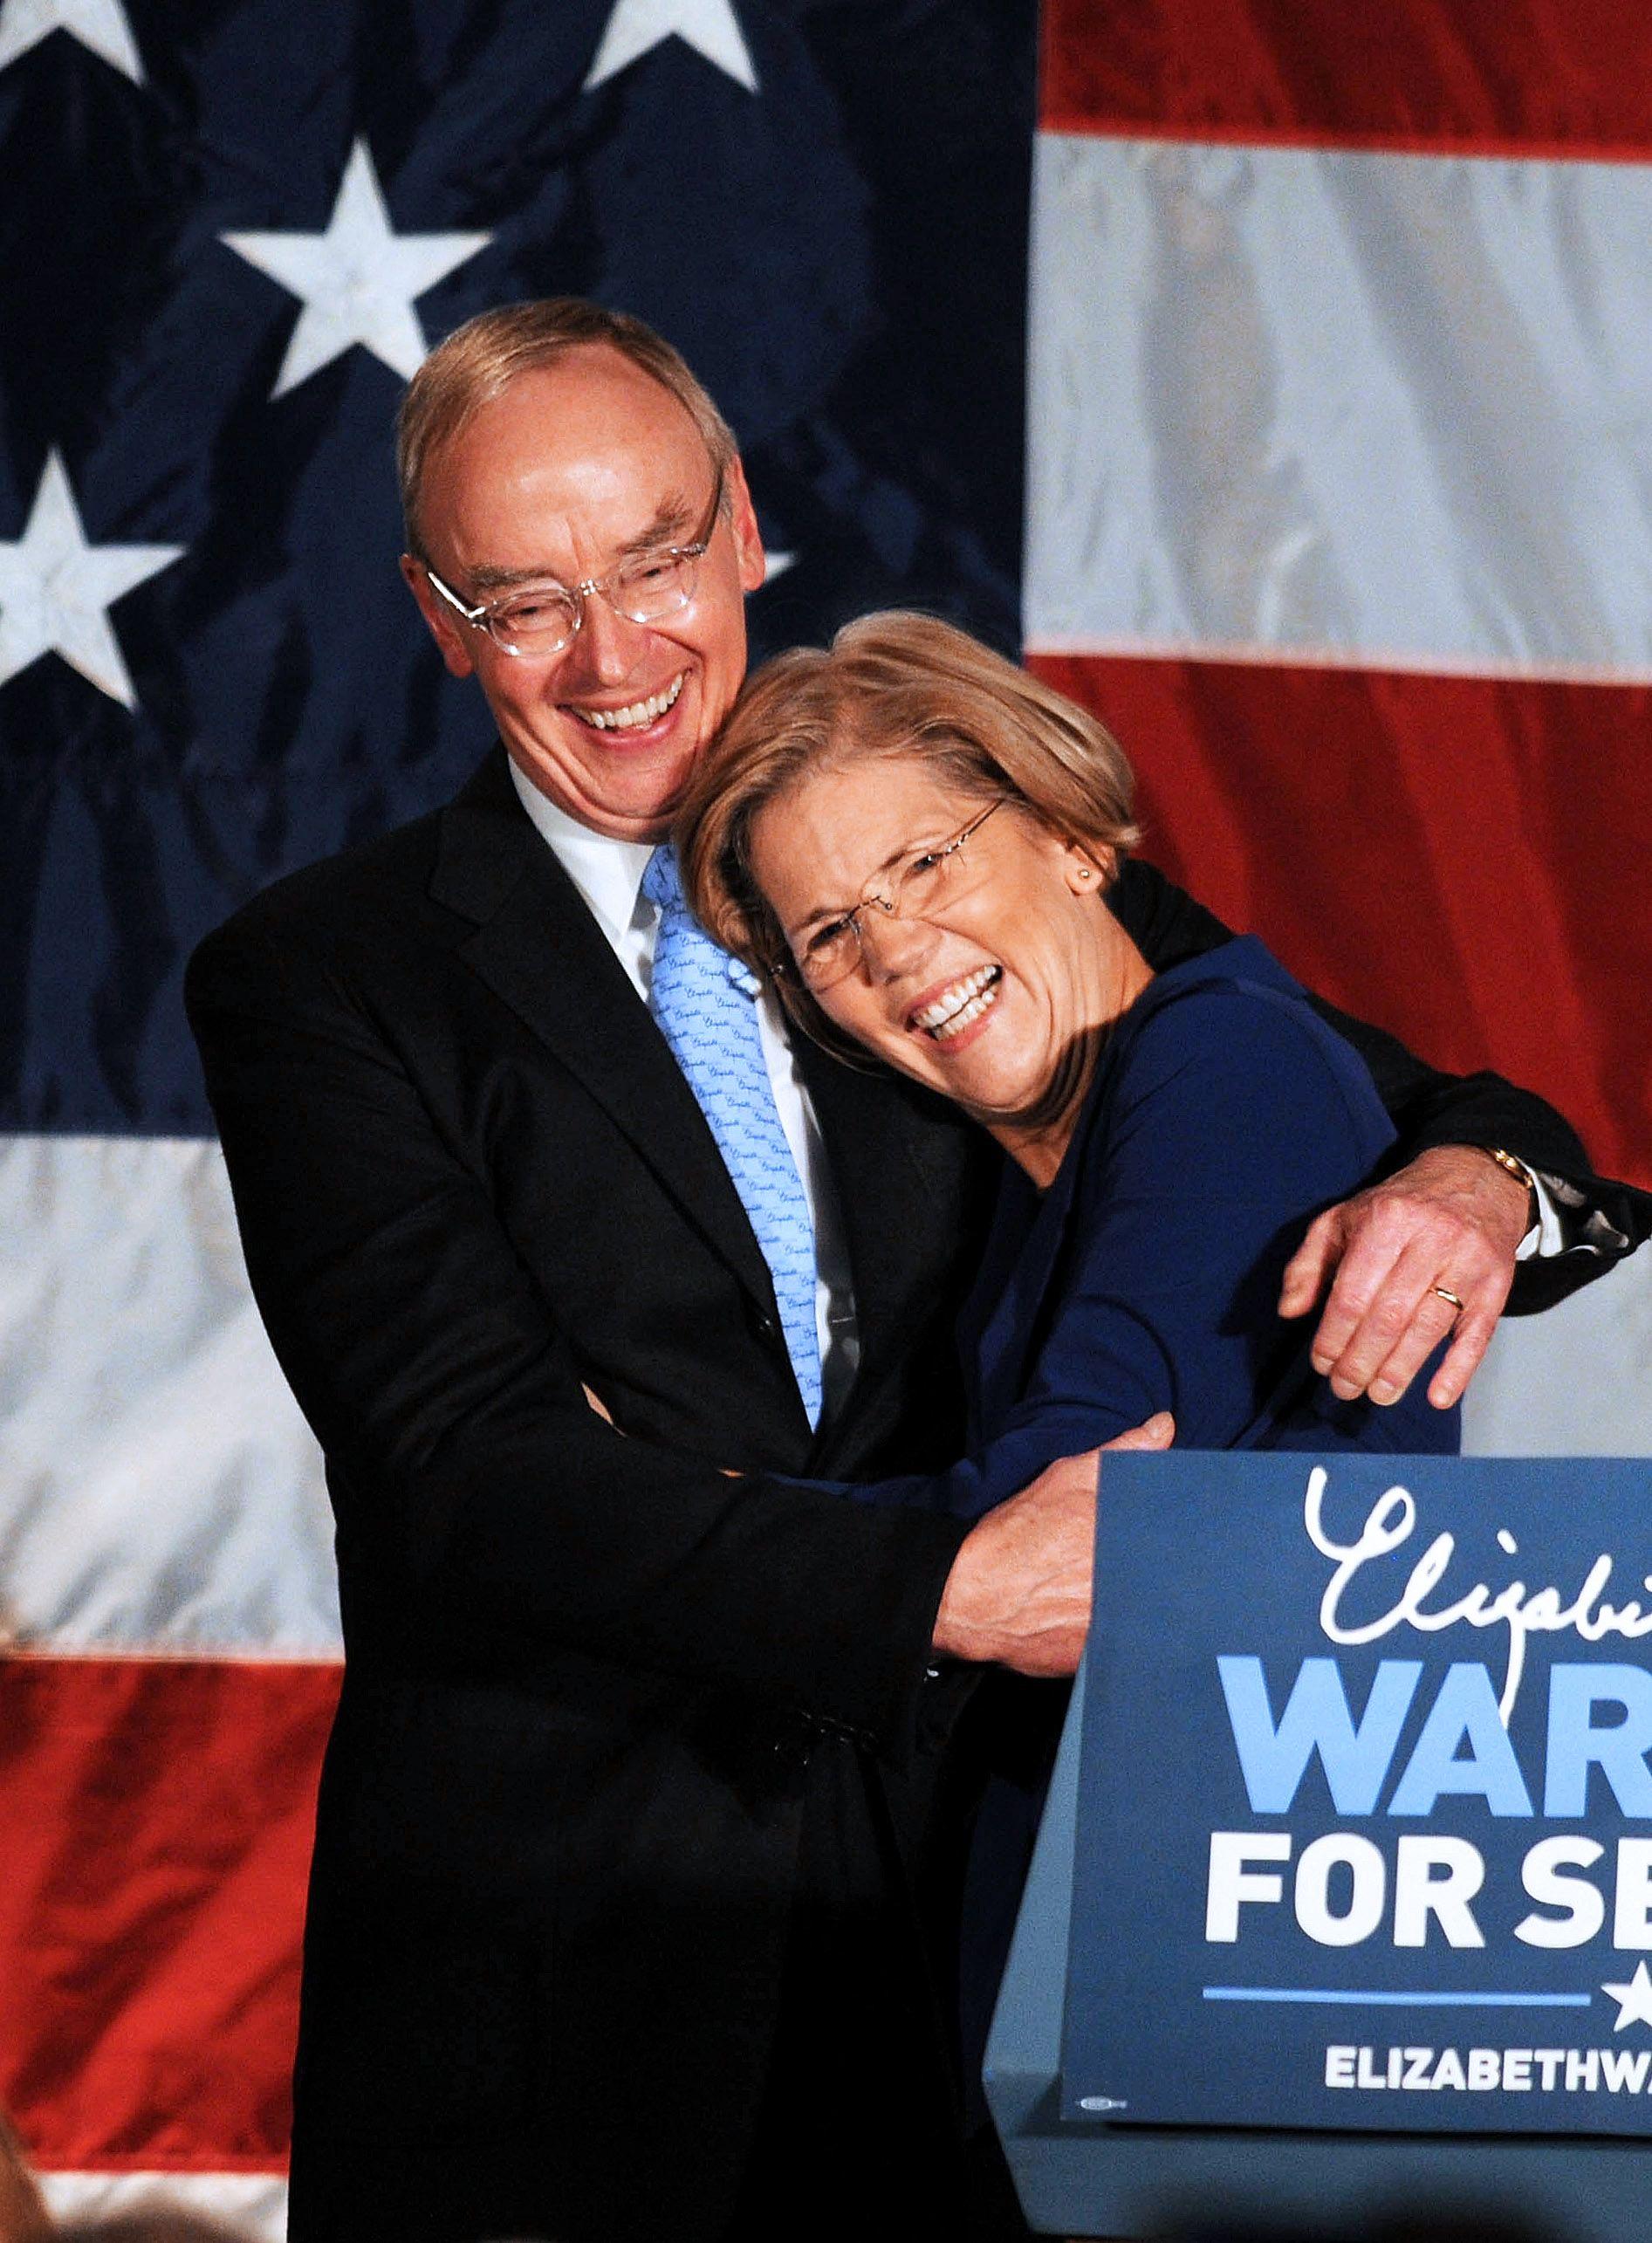 Bruce Mann, Elizabeth Warren's Husband, Is Low-Key But Incredibly Supportive